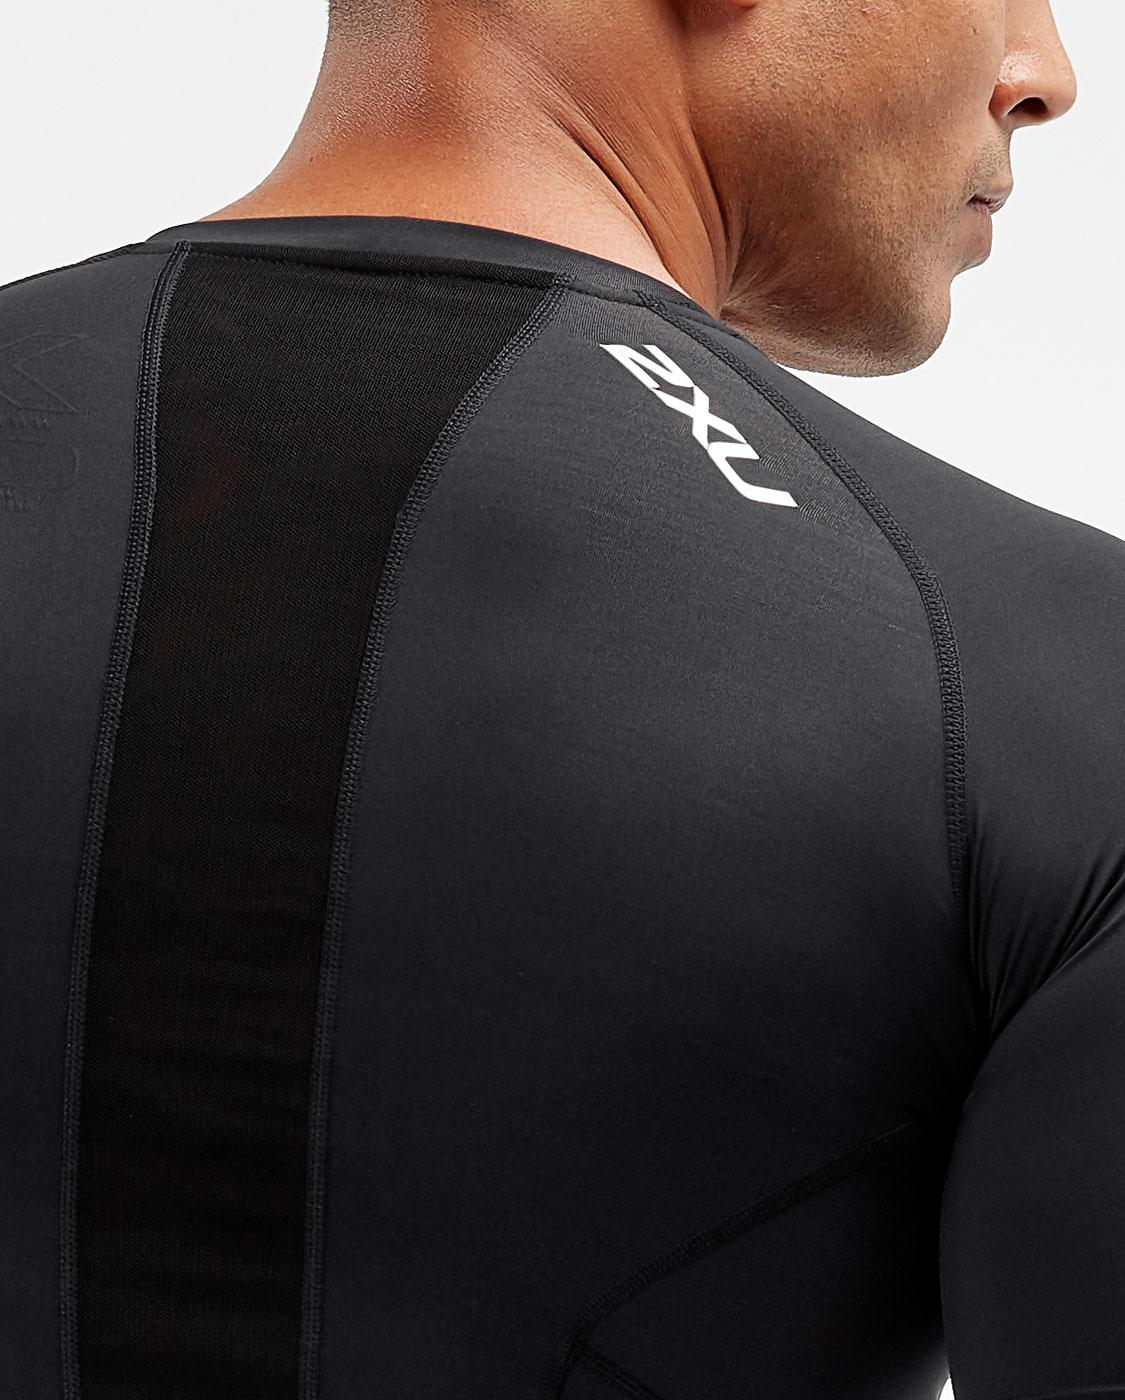 2XU Men's Compression Short Sleeve Top - Black/Silver